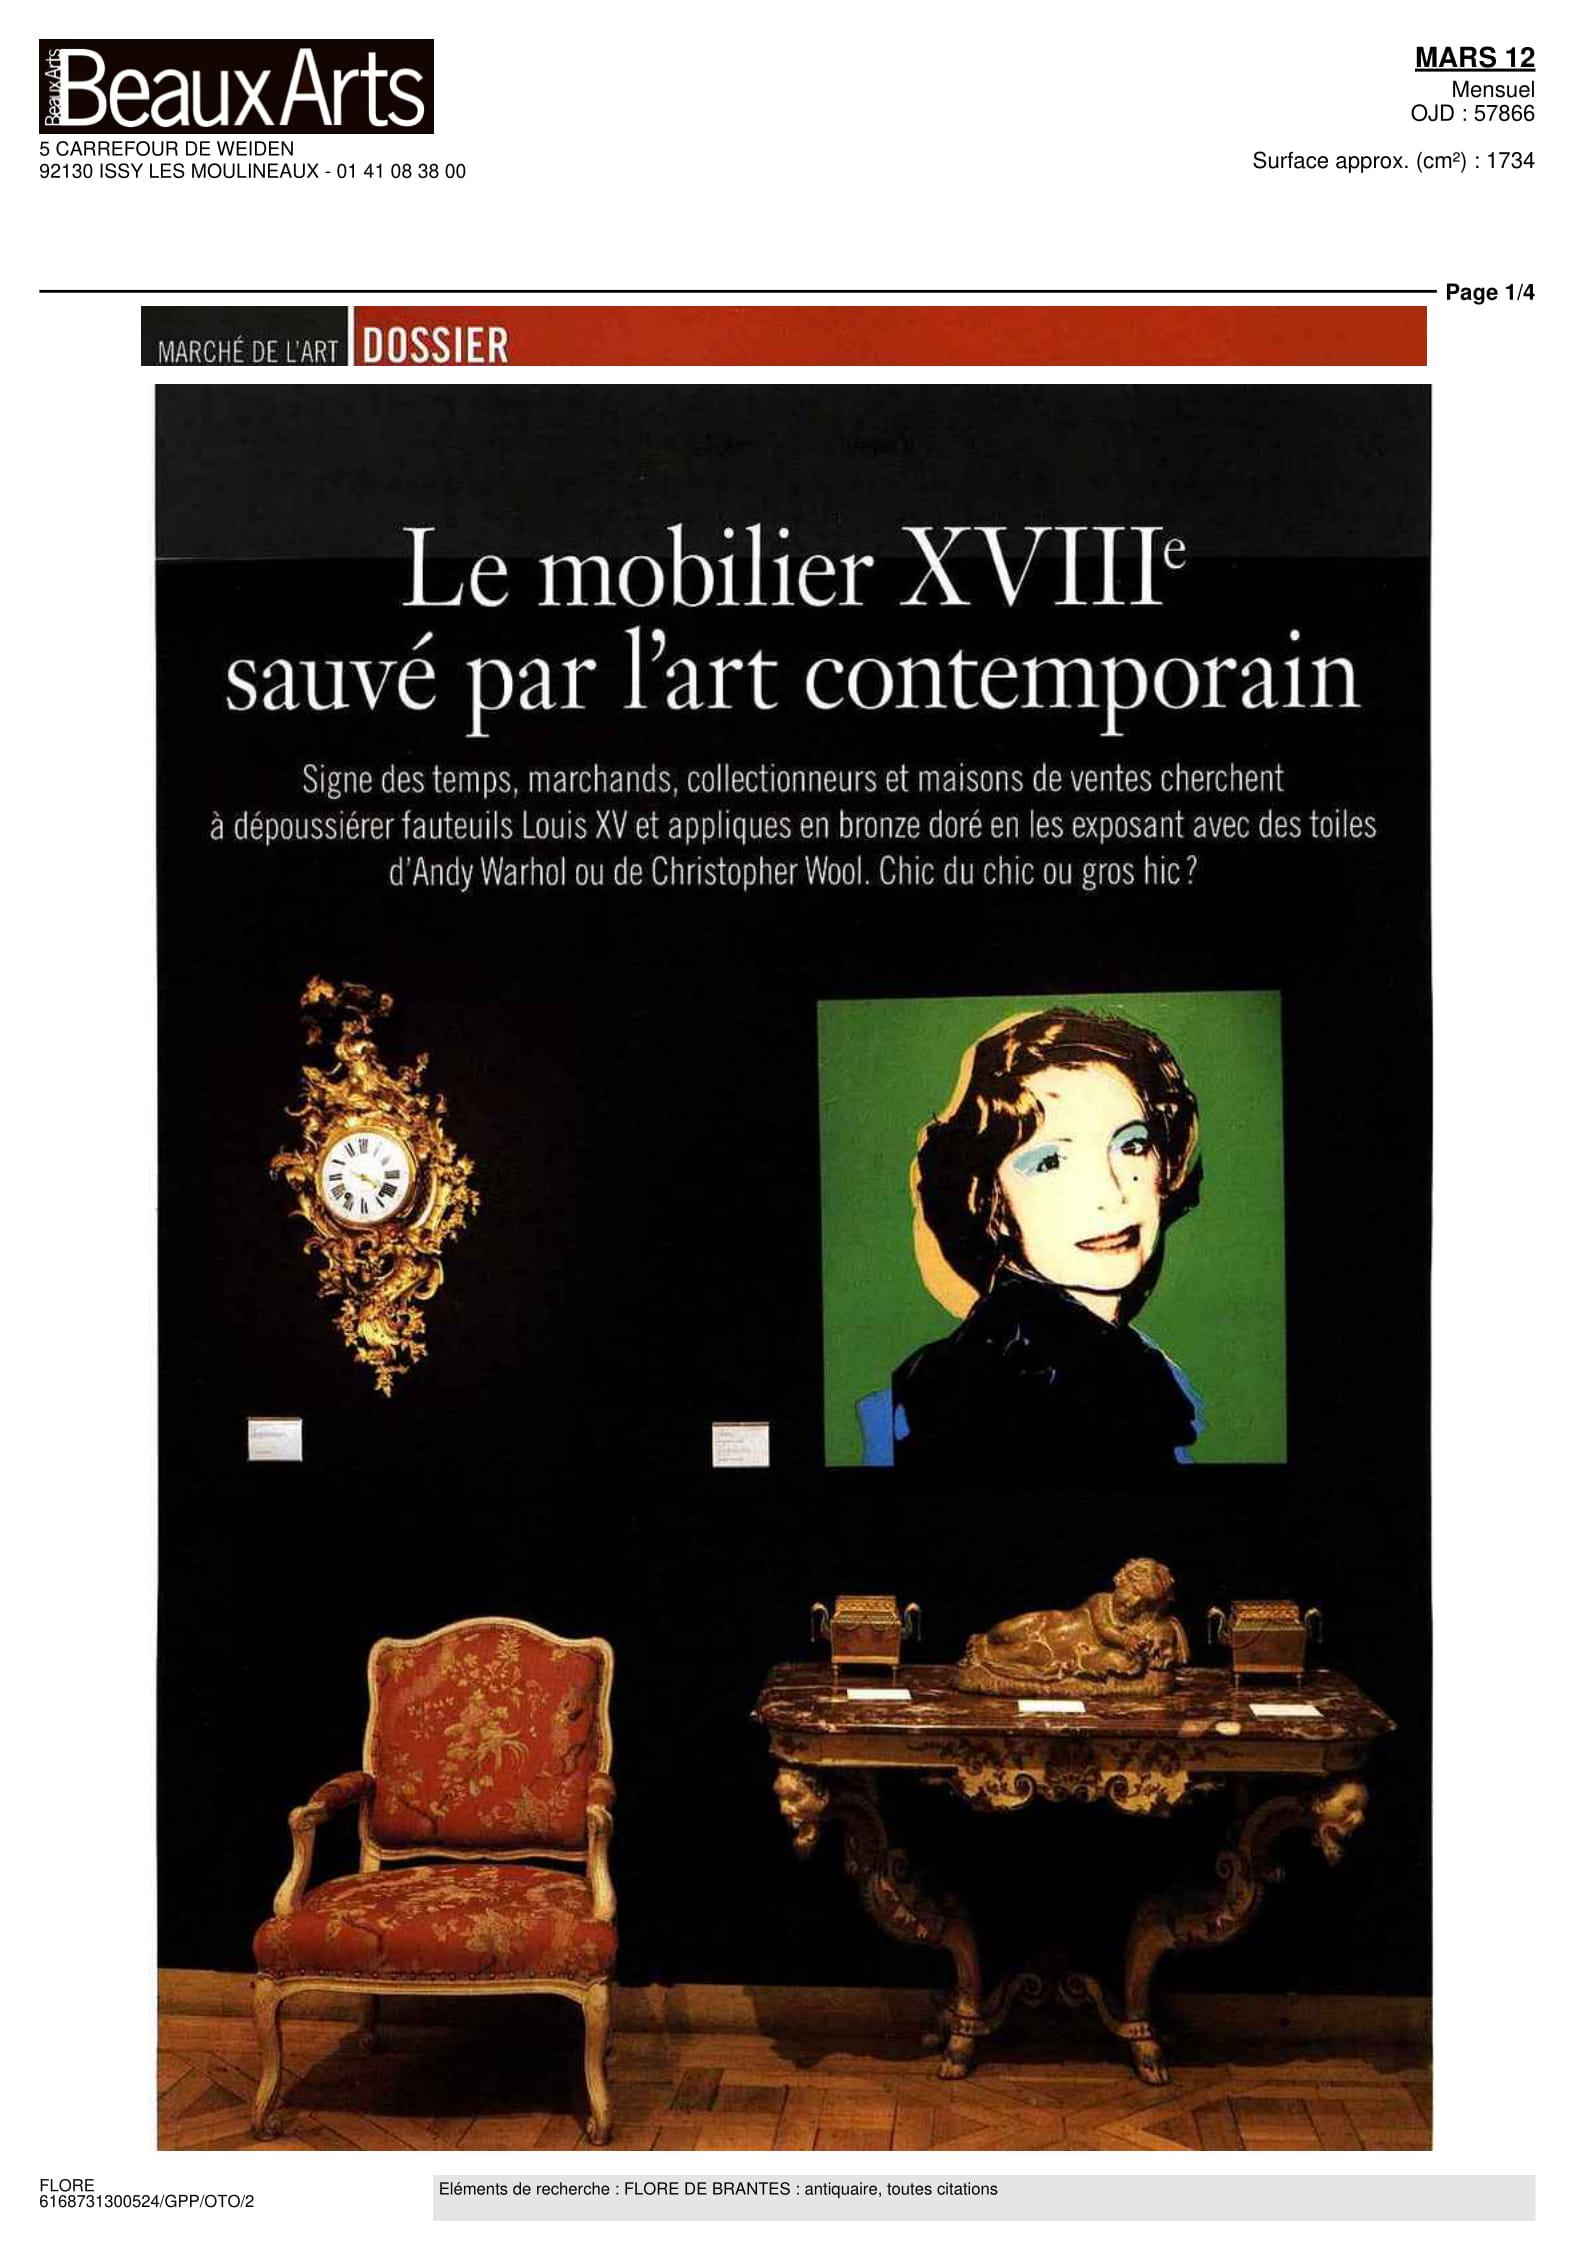 Beaux Arts Magazine — Feb. 2012